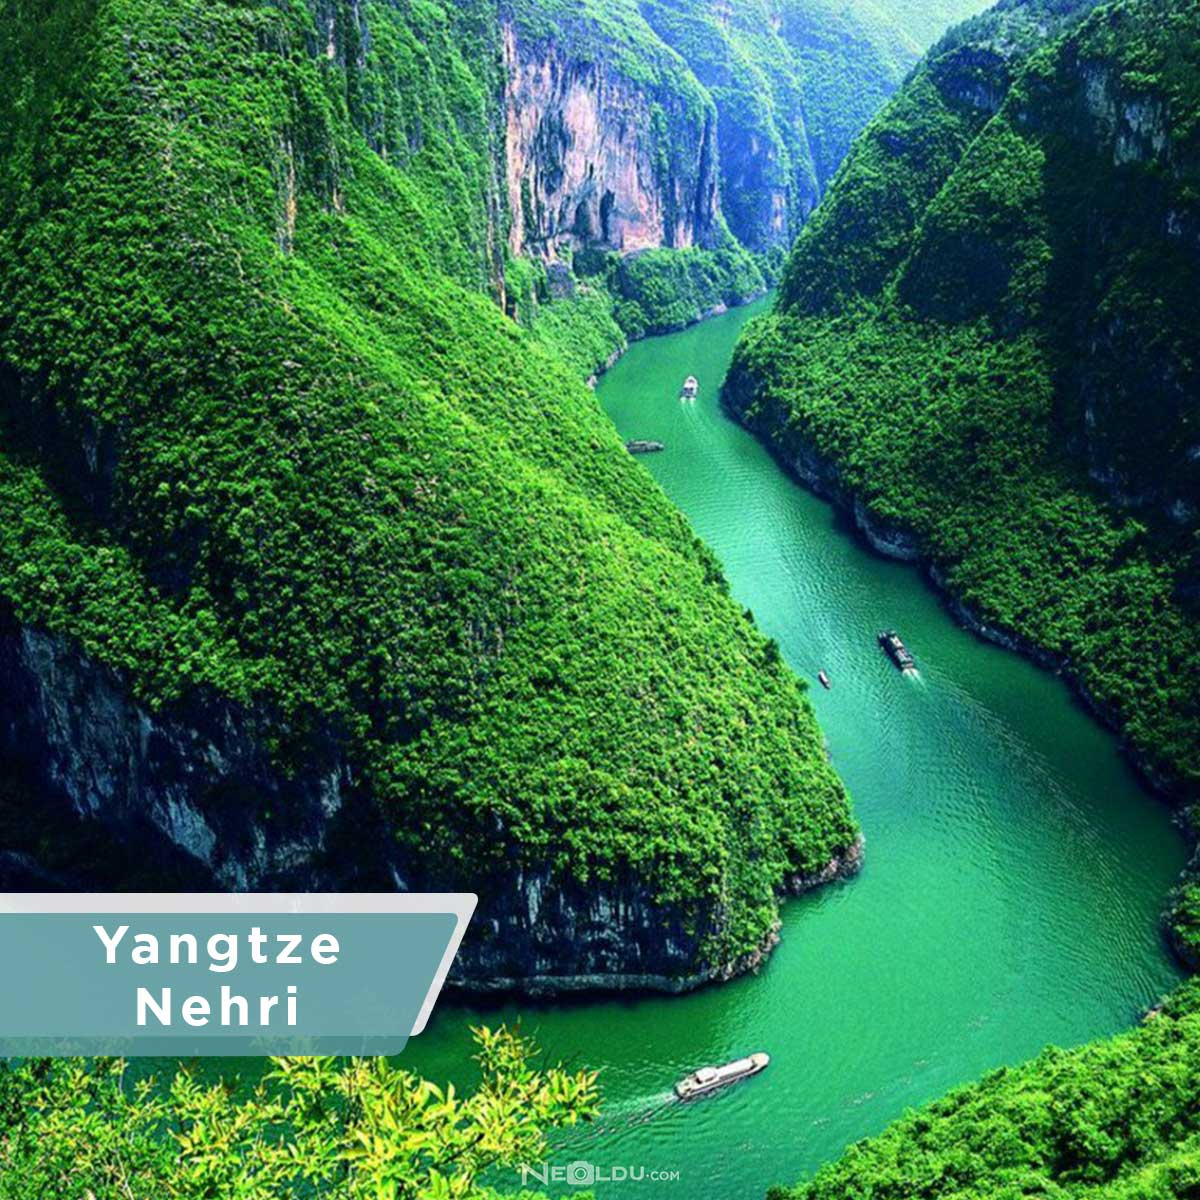 yangtze-nehri-001.jpg